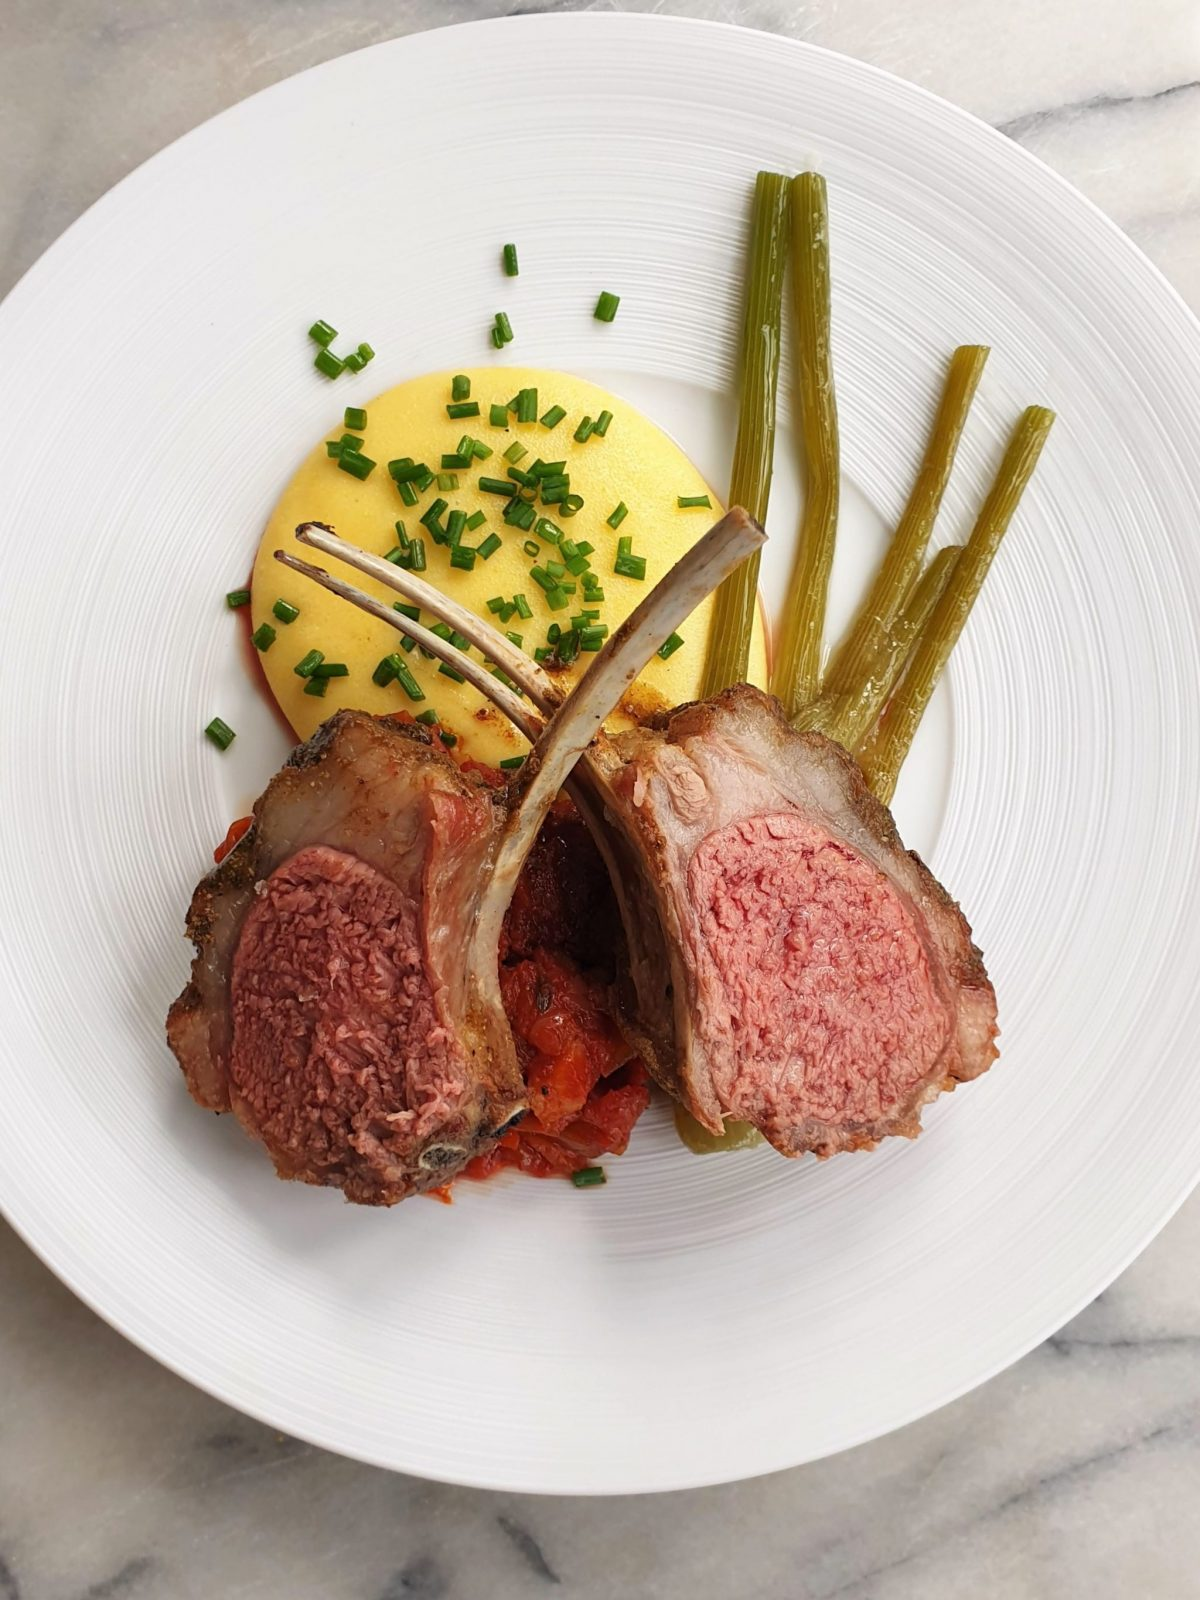 Banquist Jitin Joshi rack of lamb with polenta and Napoli sauce